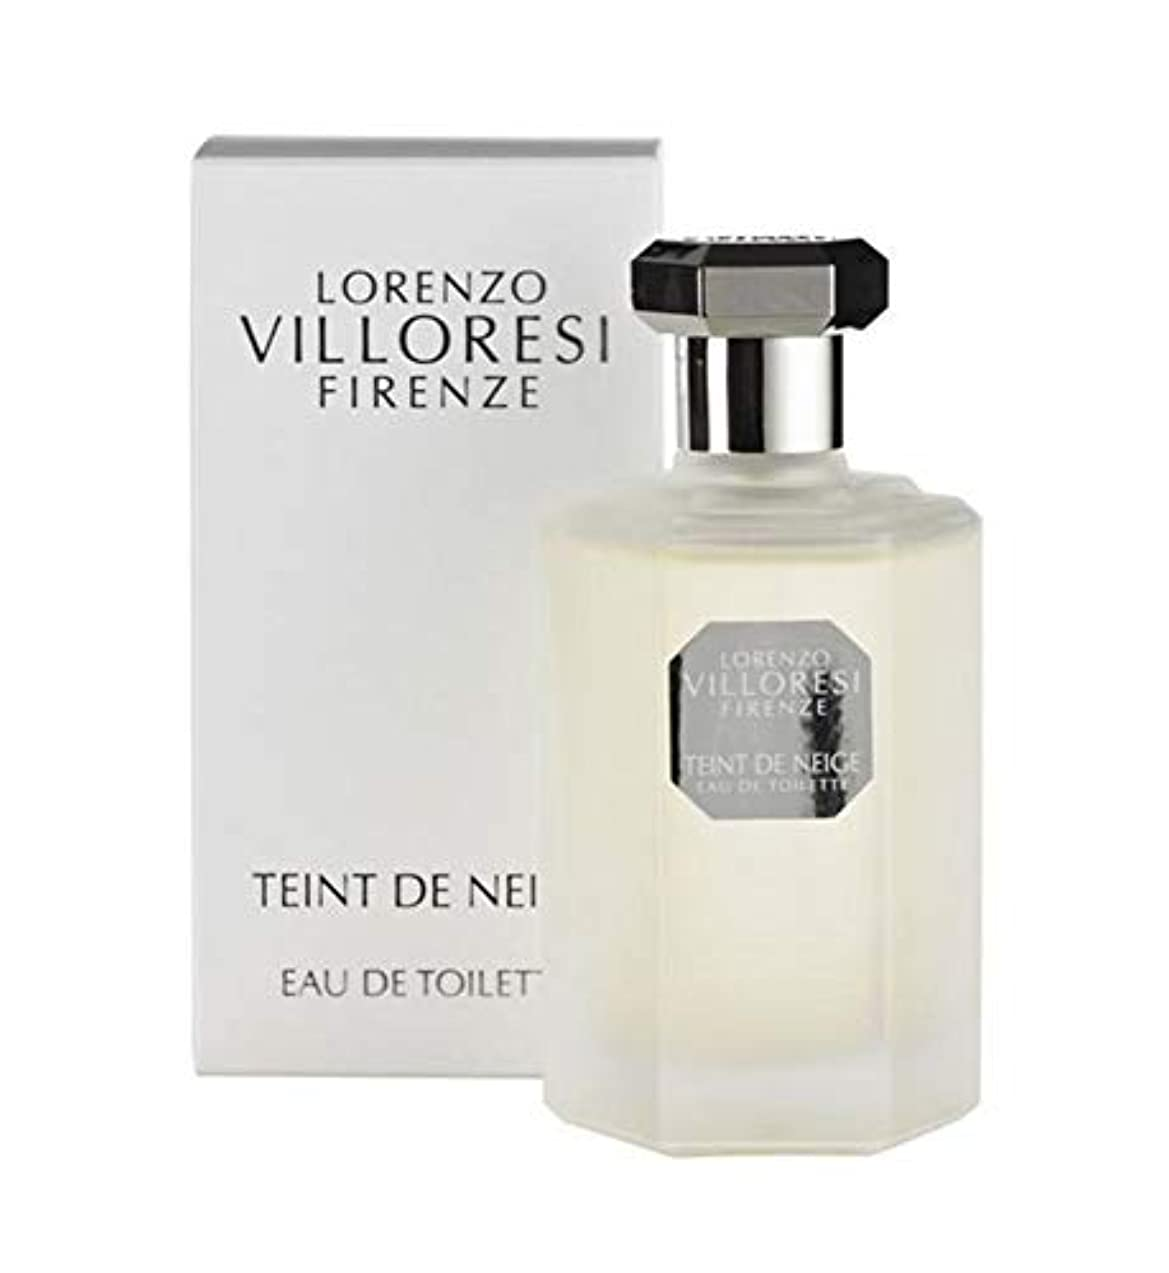 交通渋滞残忍な病Lorenzo Villoresi Teint De Neige Eau De Toilette Spray 100Ml